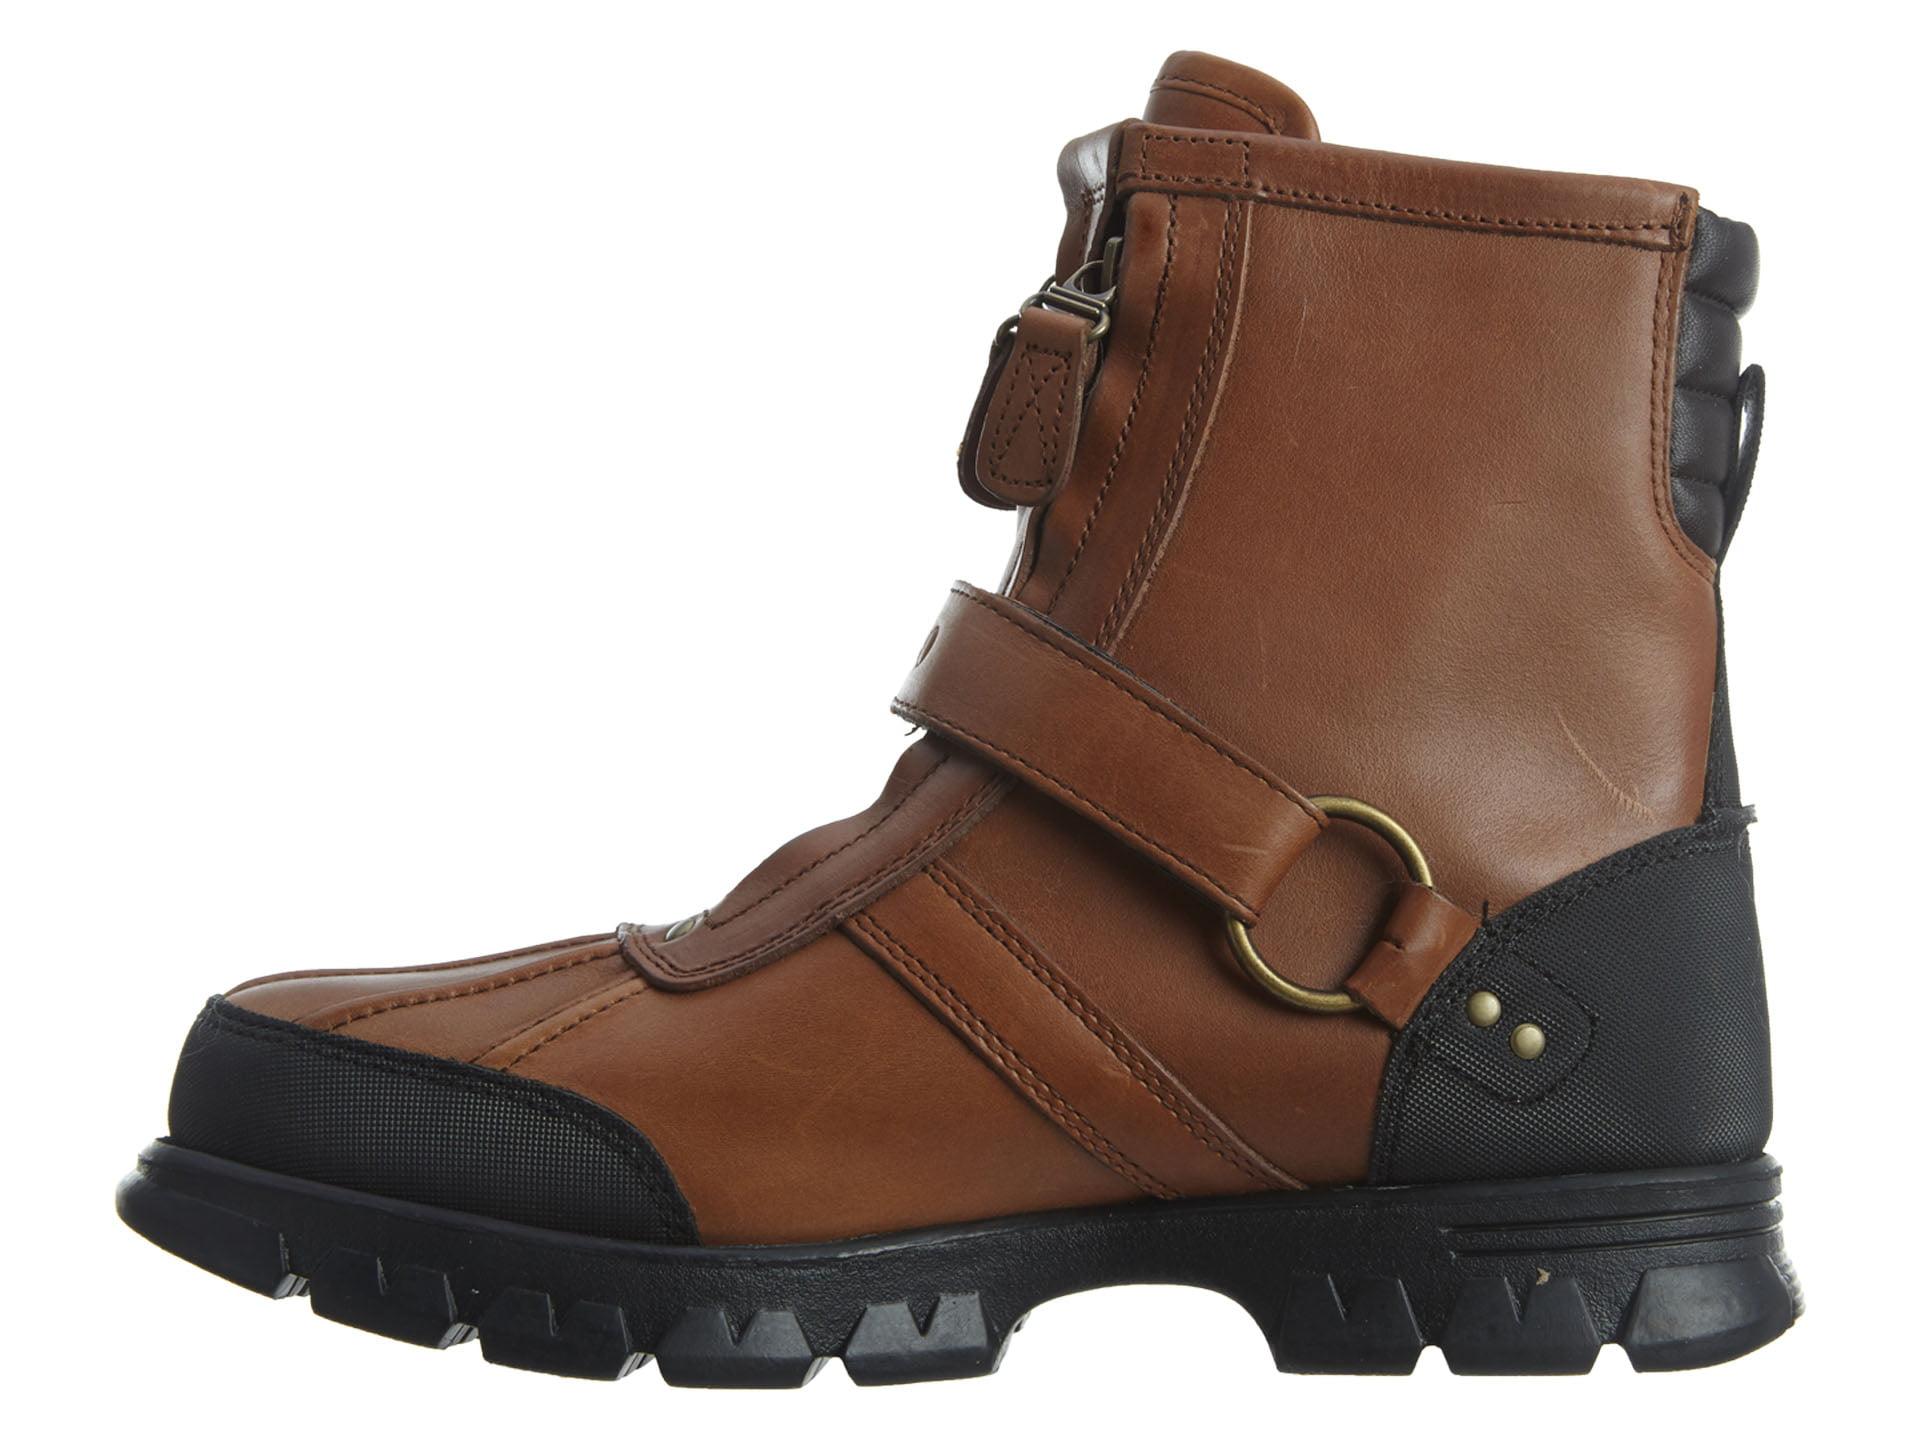 P Economical, stylish, and eye-catching shoes